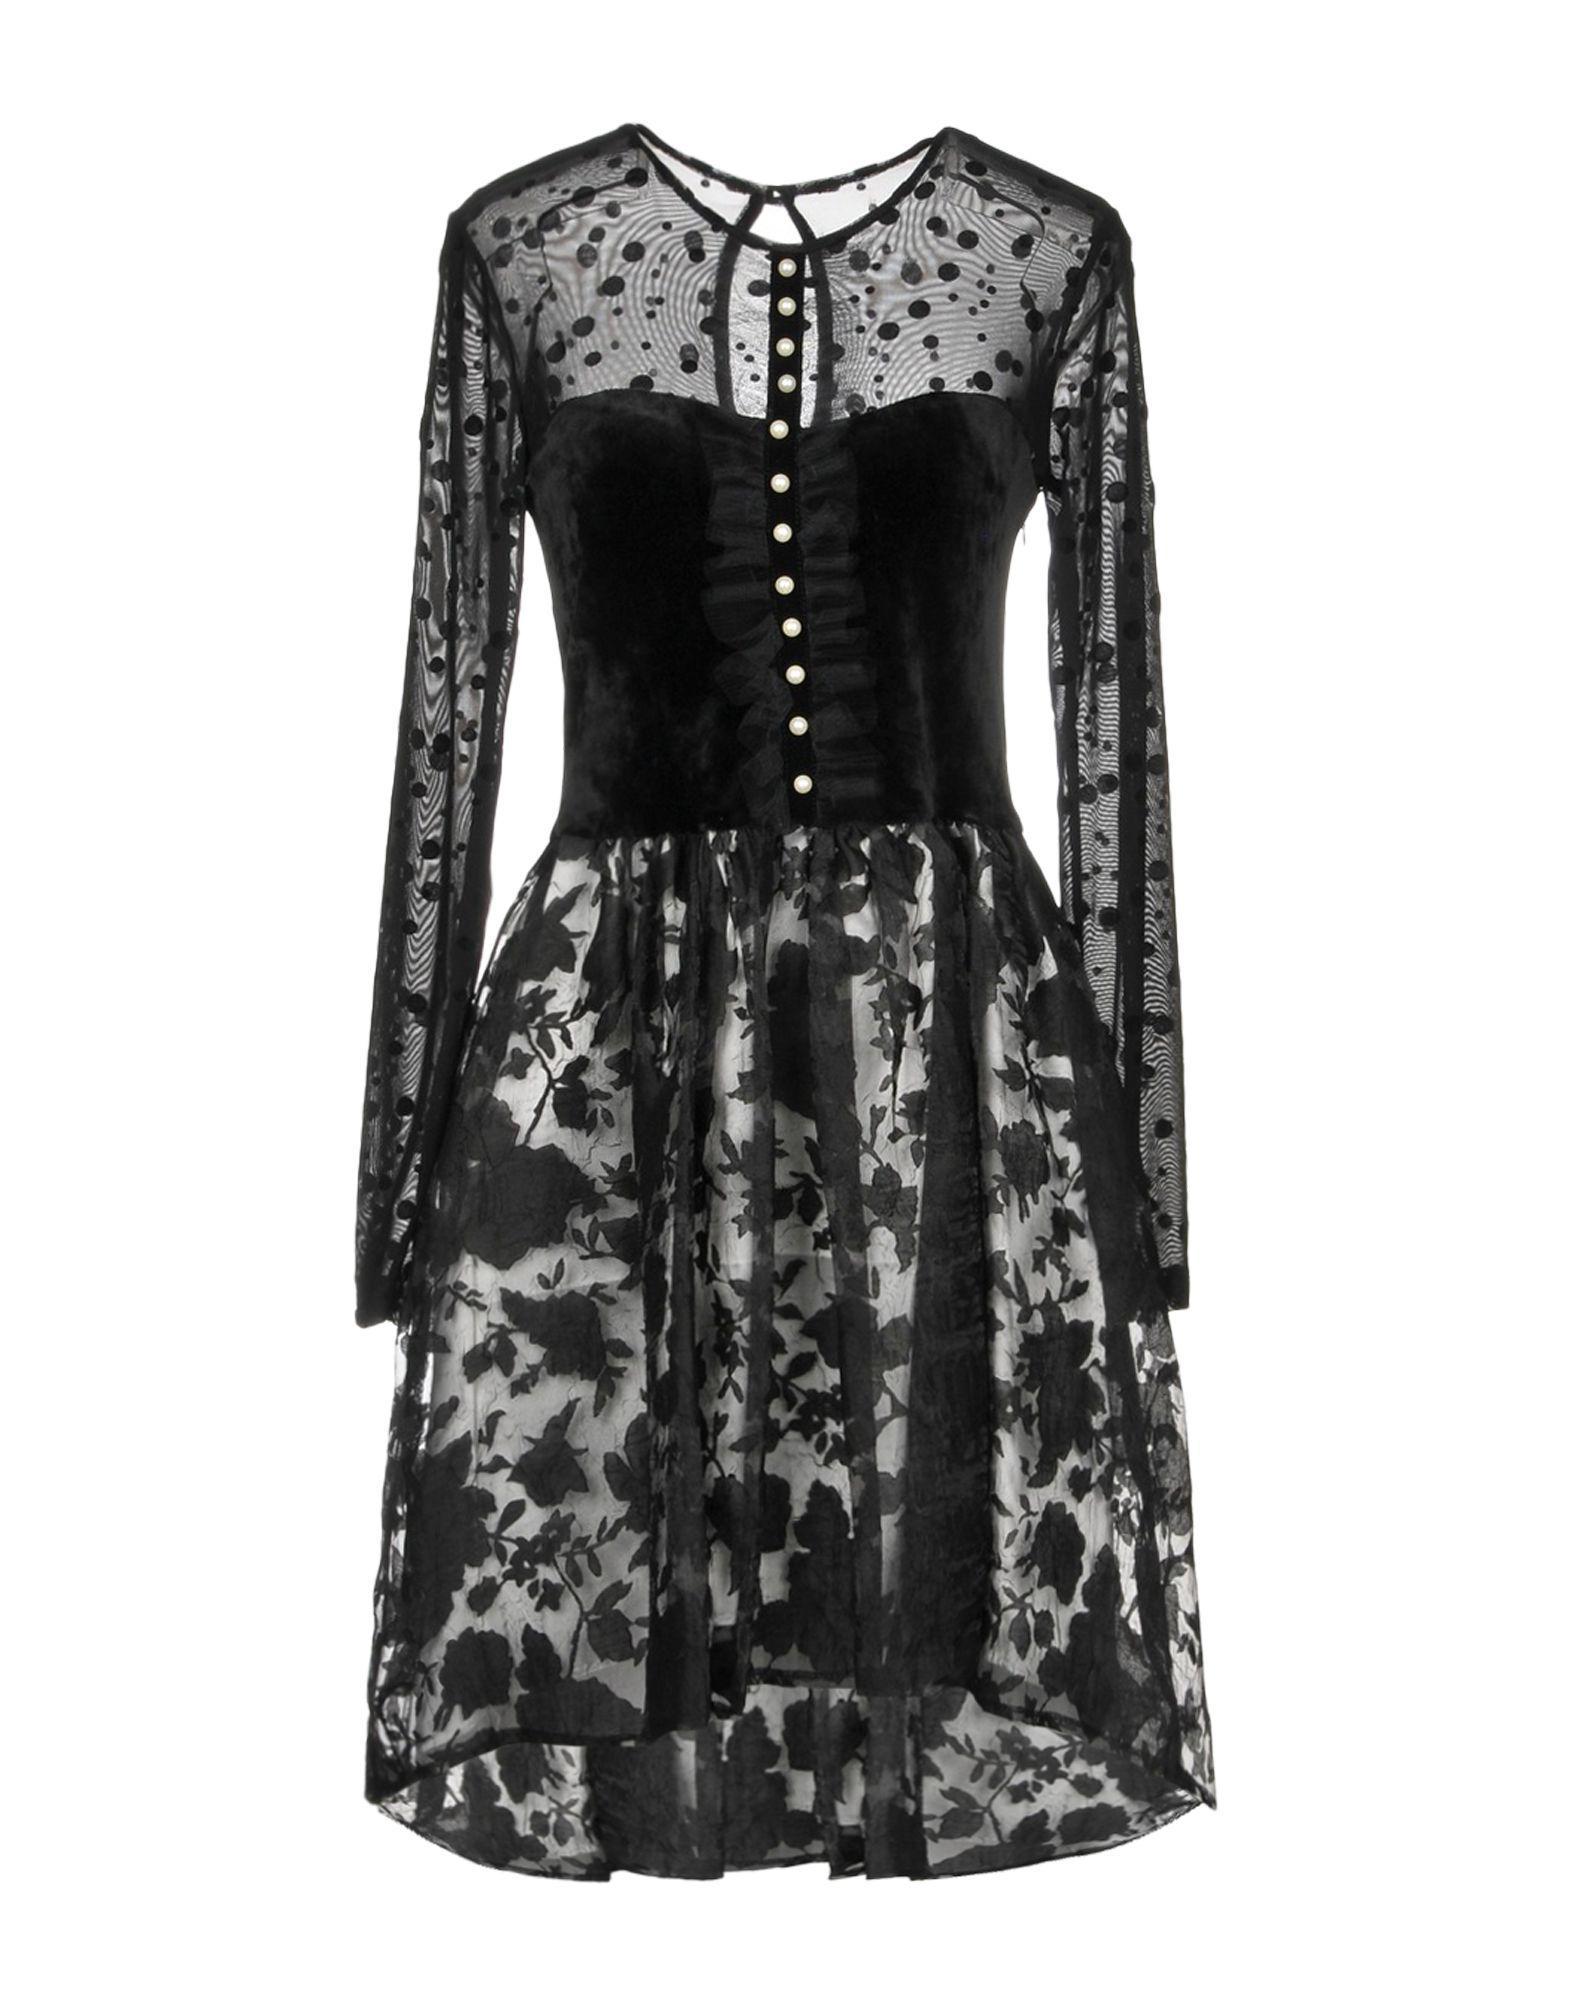 Lyst - Robe courte Rinascimento en coloris Noir 94bf49fc7387